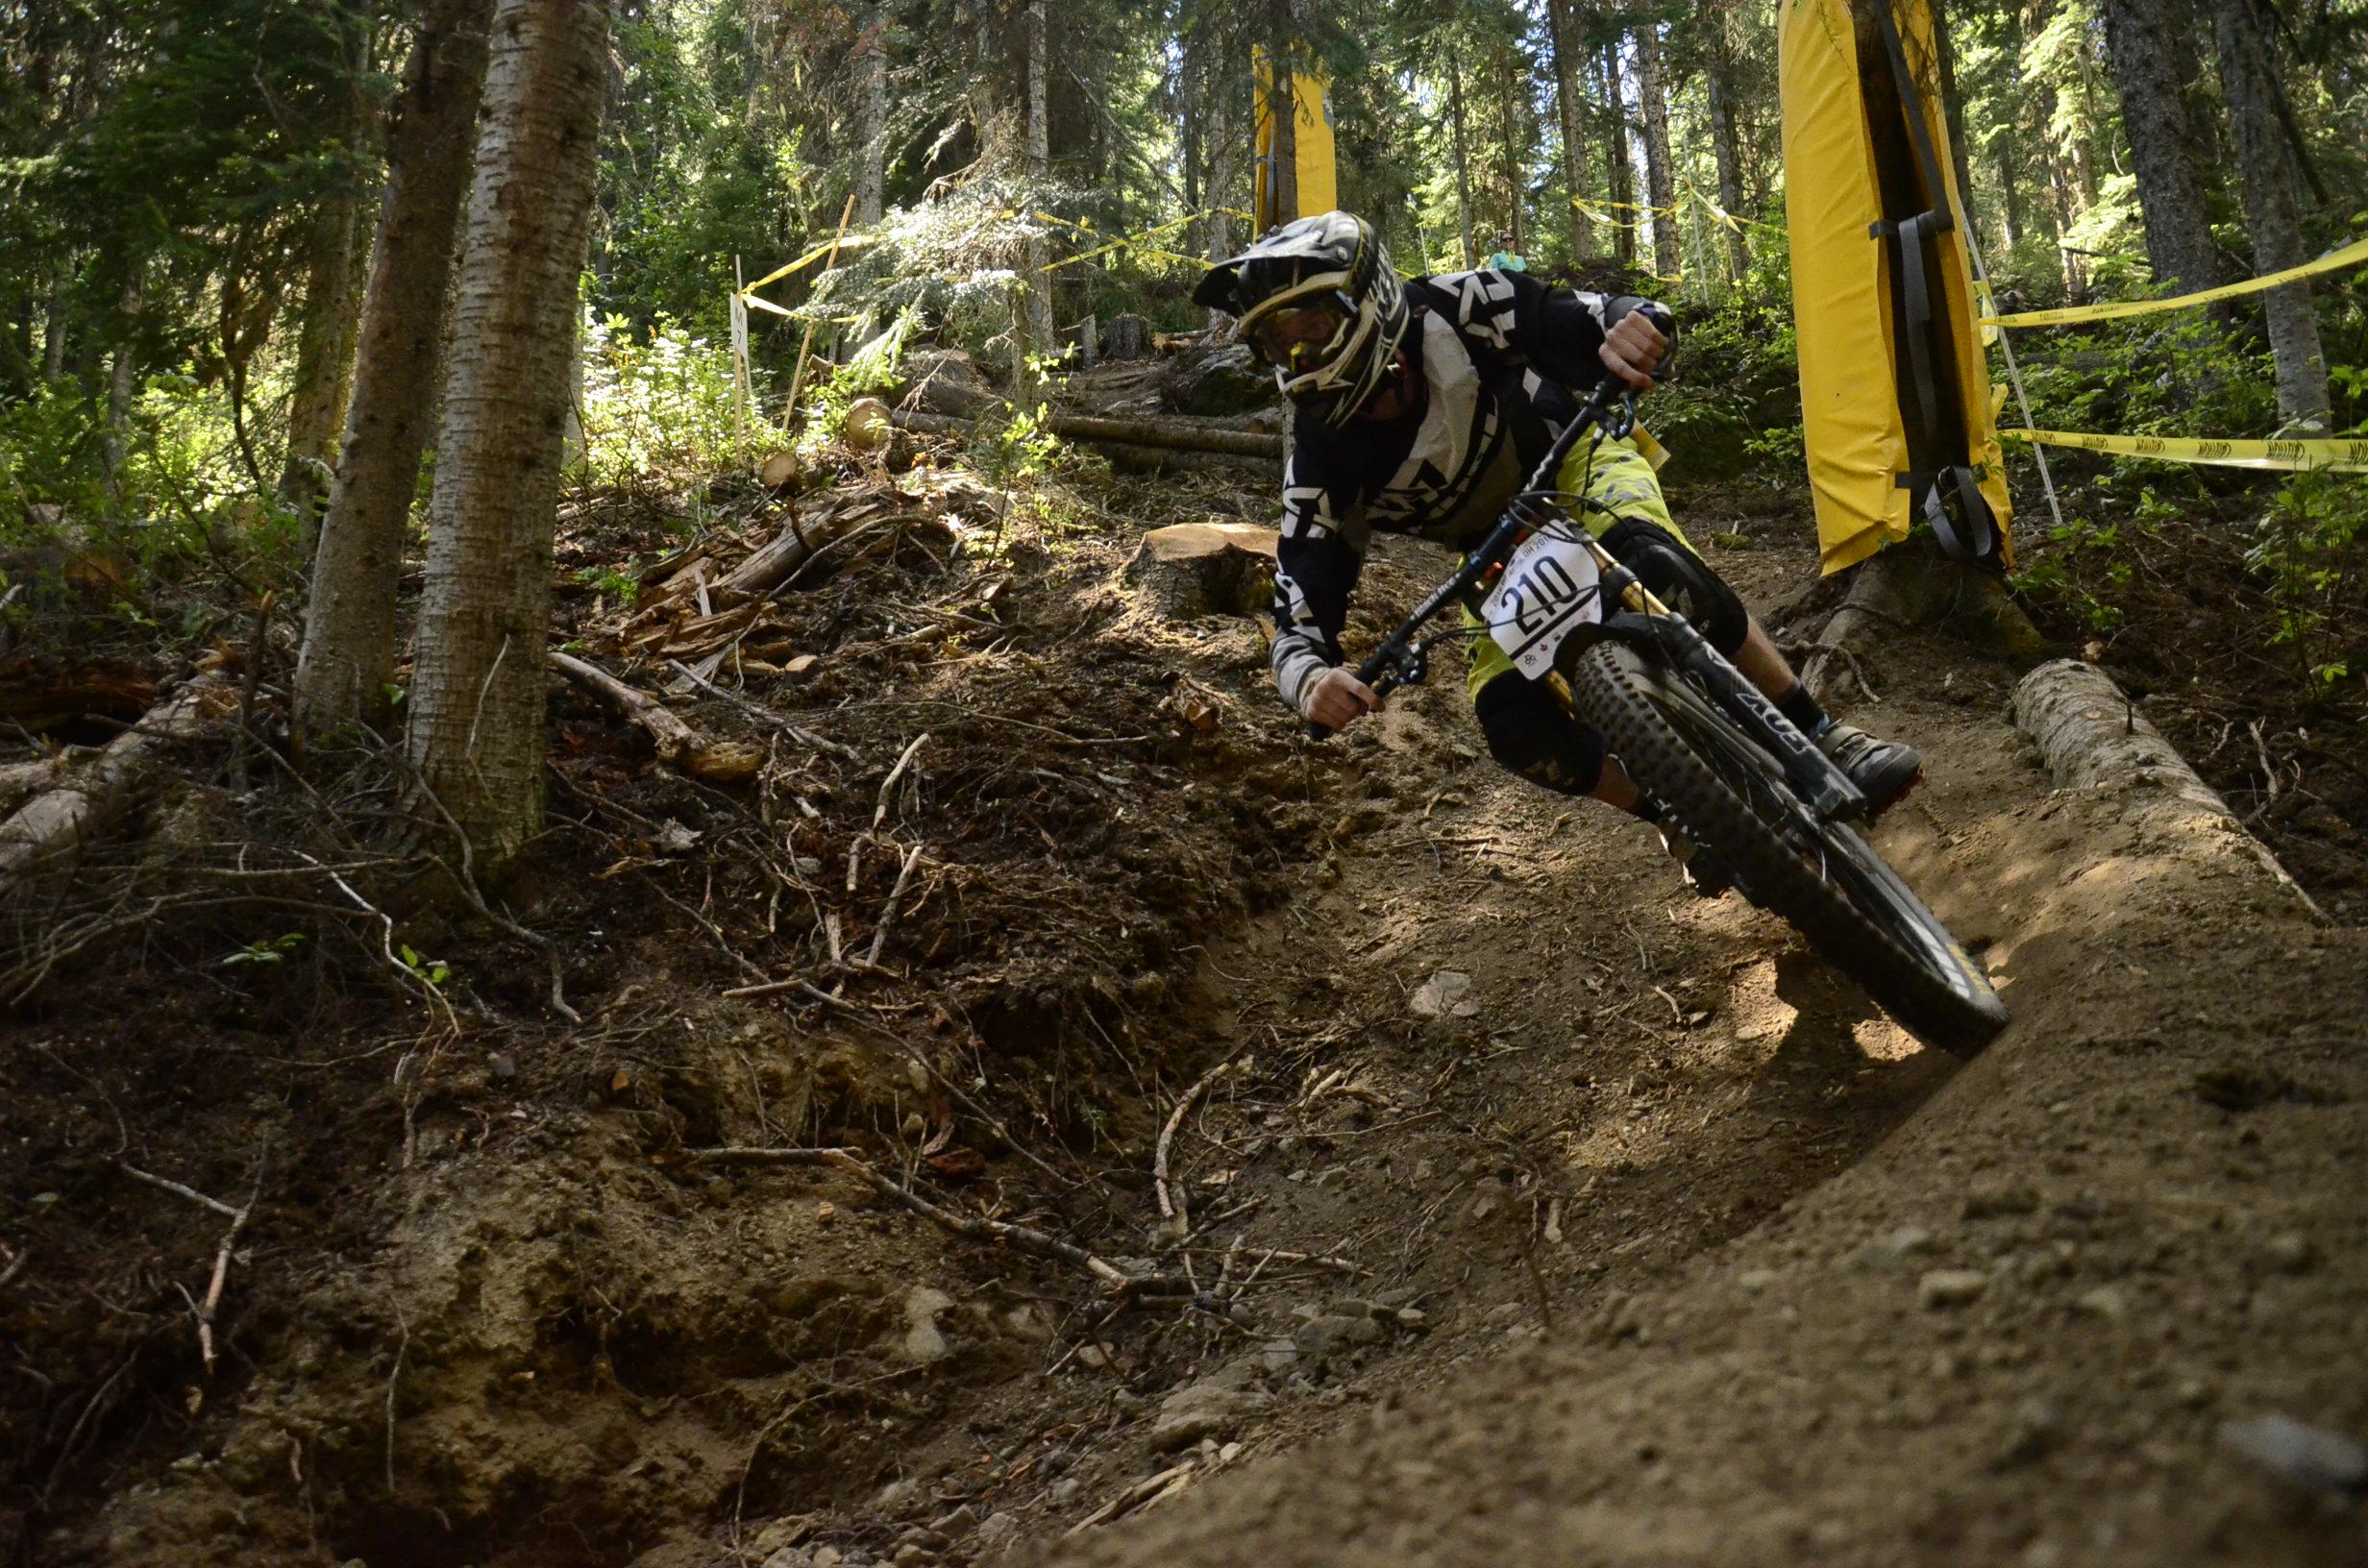 Rider Cam Quadrelli takes a hard turn down the new Sun Peaks course. - Photo Jamie Shinkewski